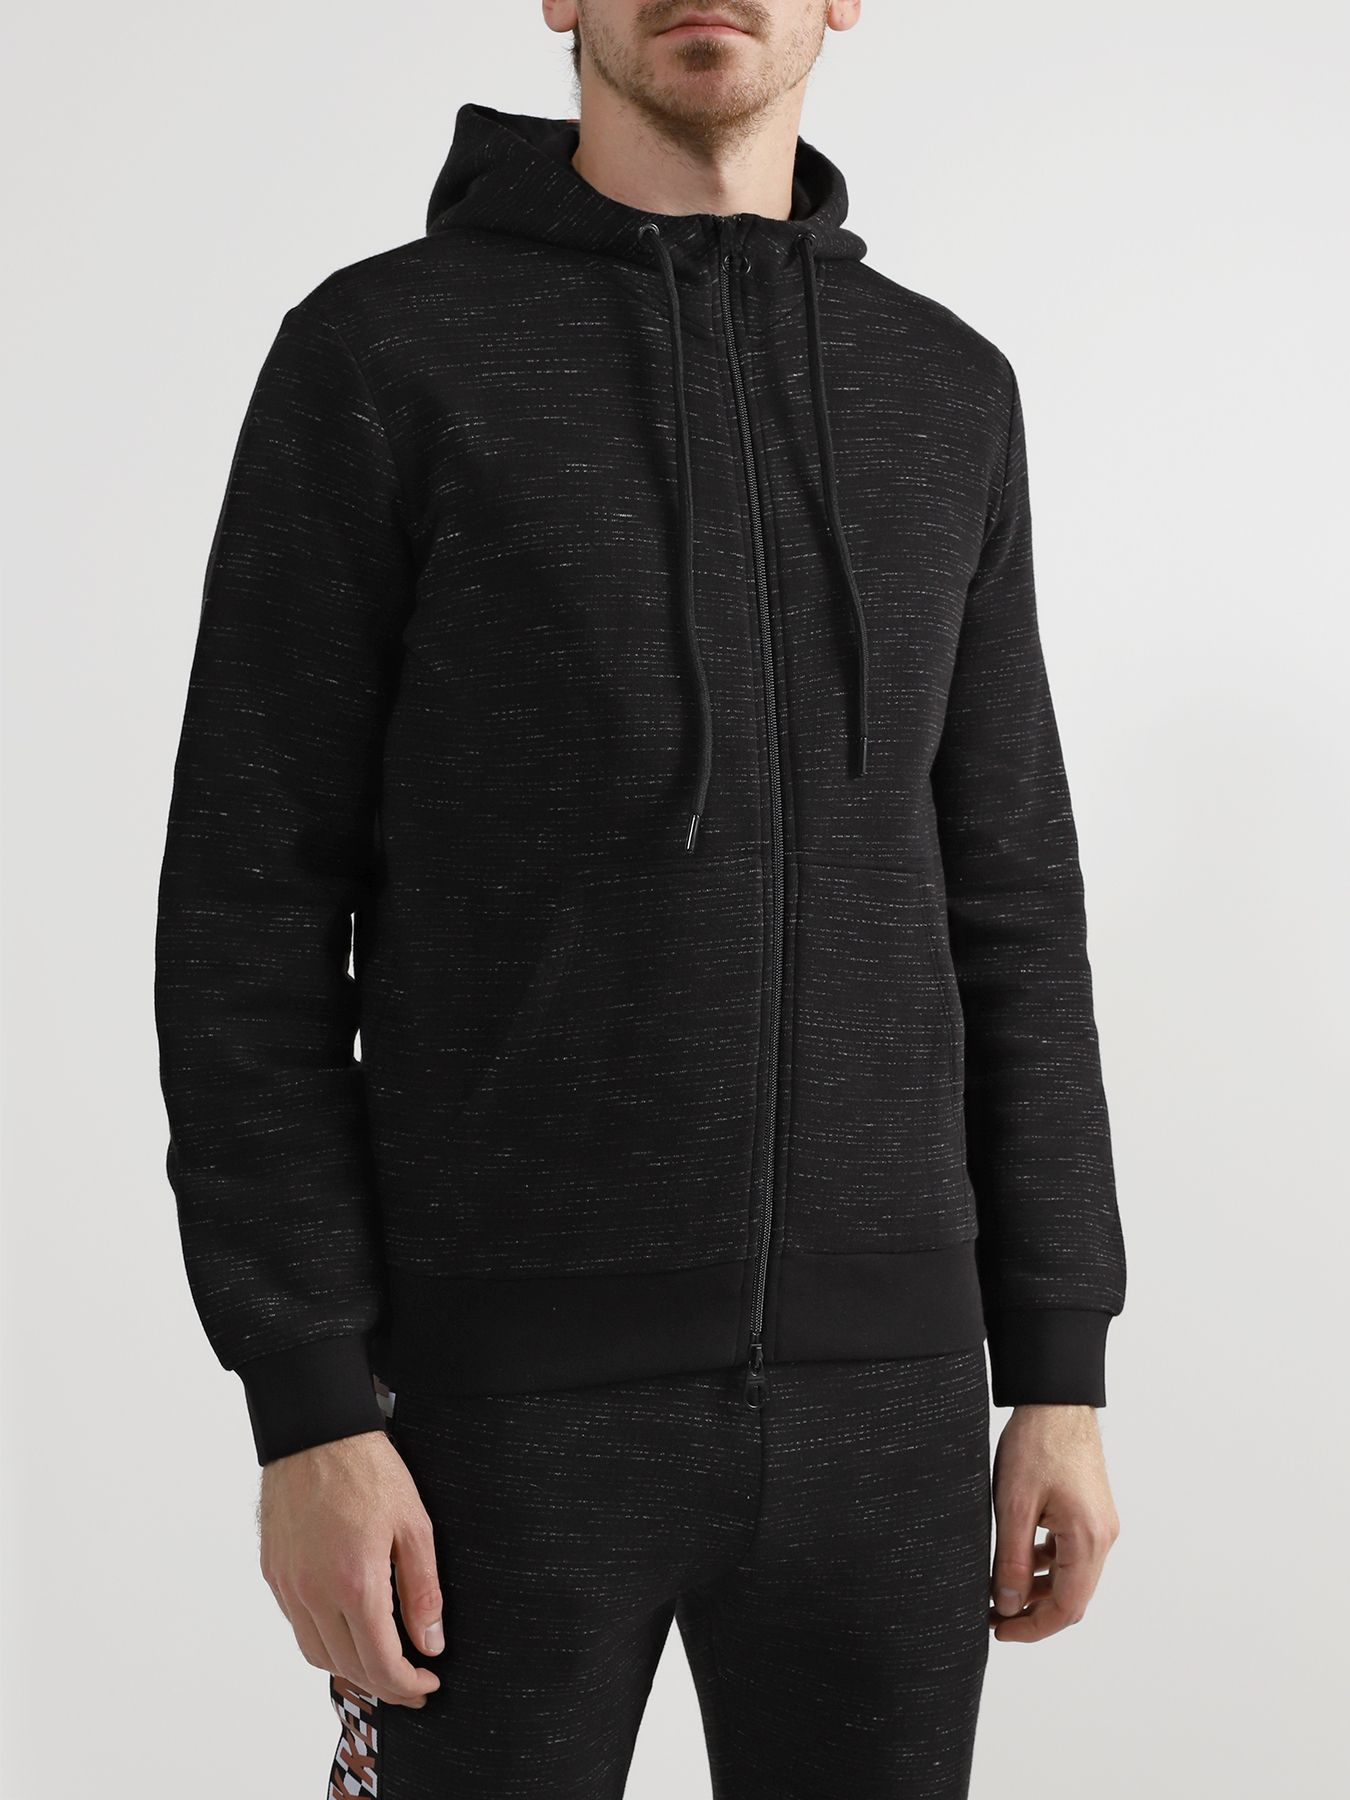 Костюм Bikkembergs Спортивный костюм костюм спортивный blacksi blacksi mp002xw0h59r